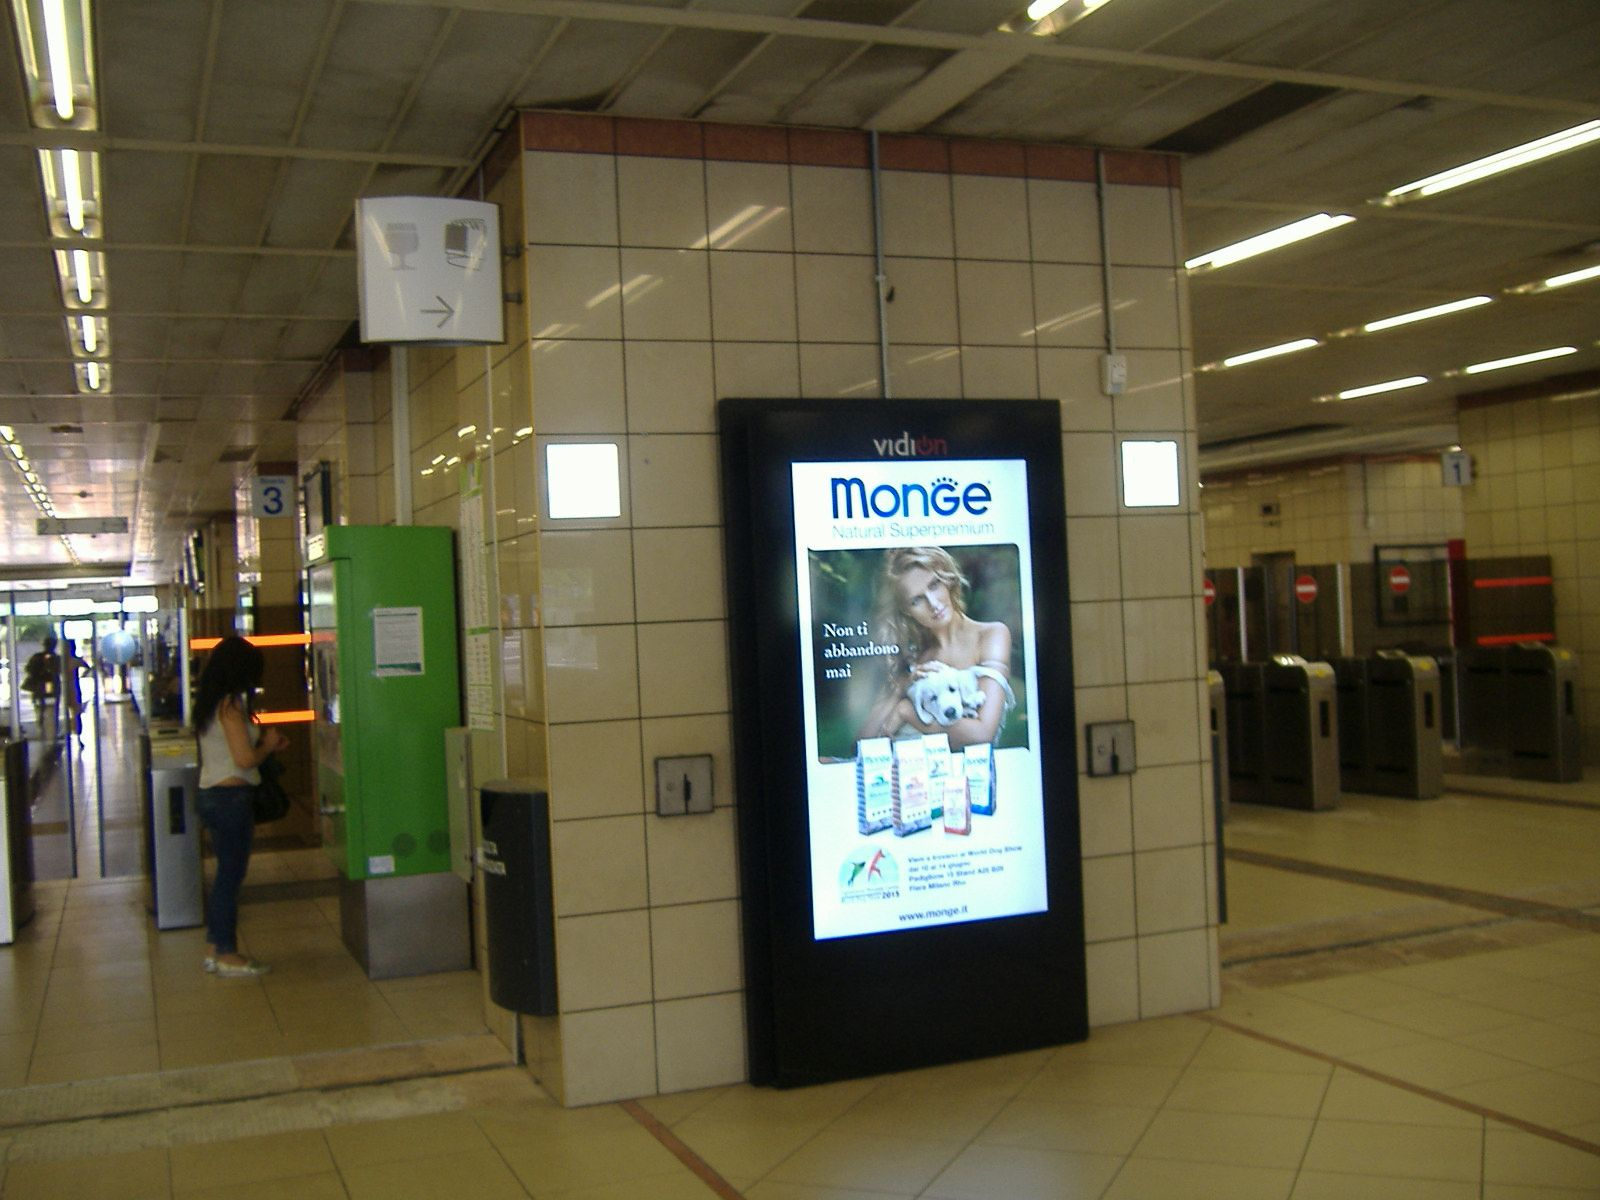 Digimupi Monge - Milano Stazione Domodossola giugno 2015